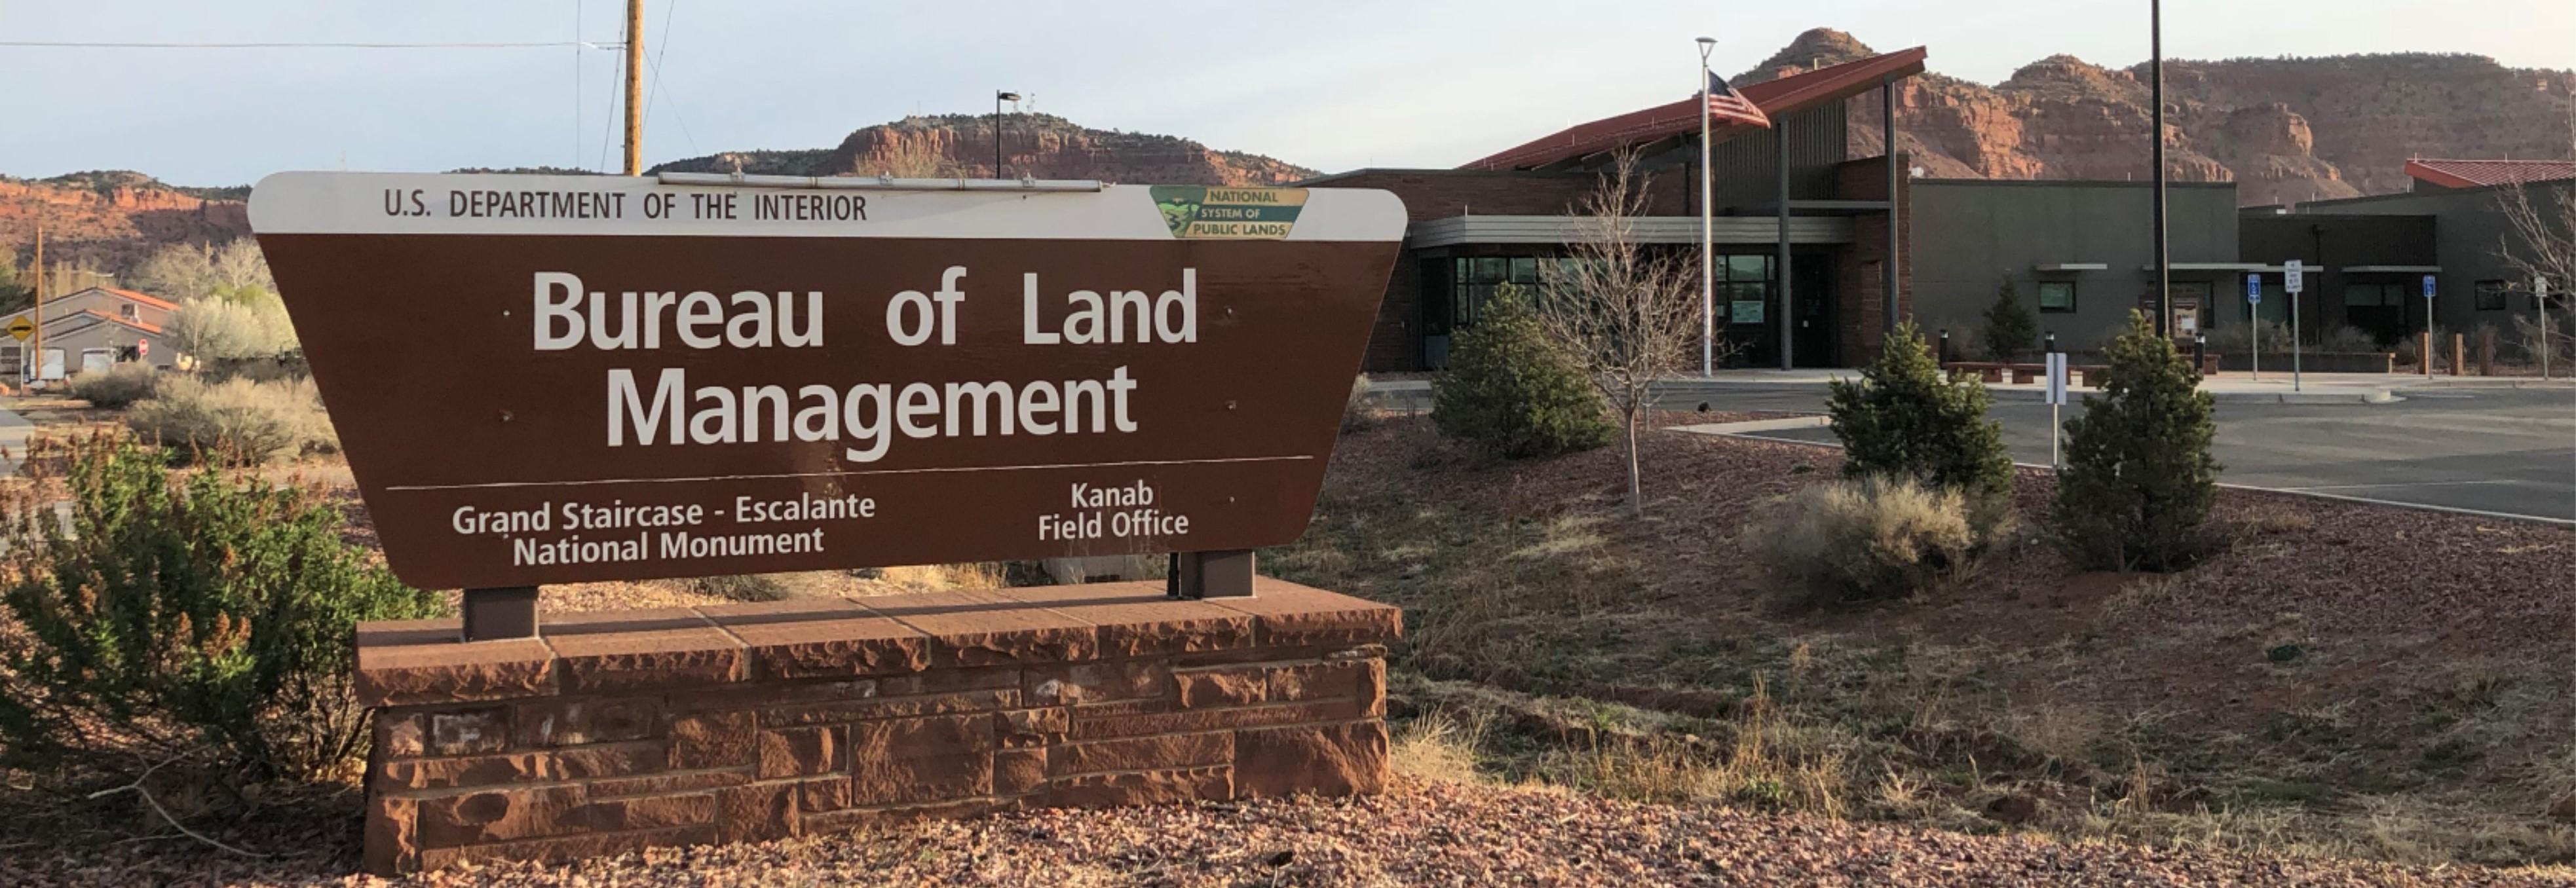 Utah - Kanab Field Office | BUREAU OF LAND MANAGEMENT